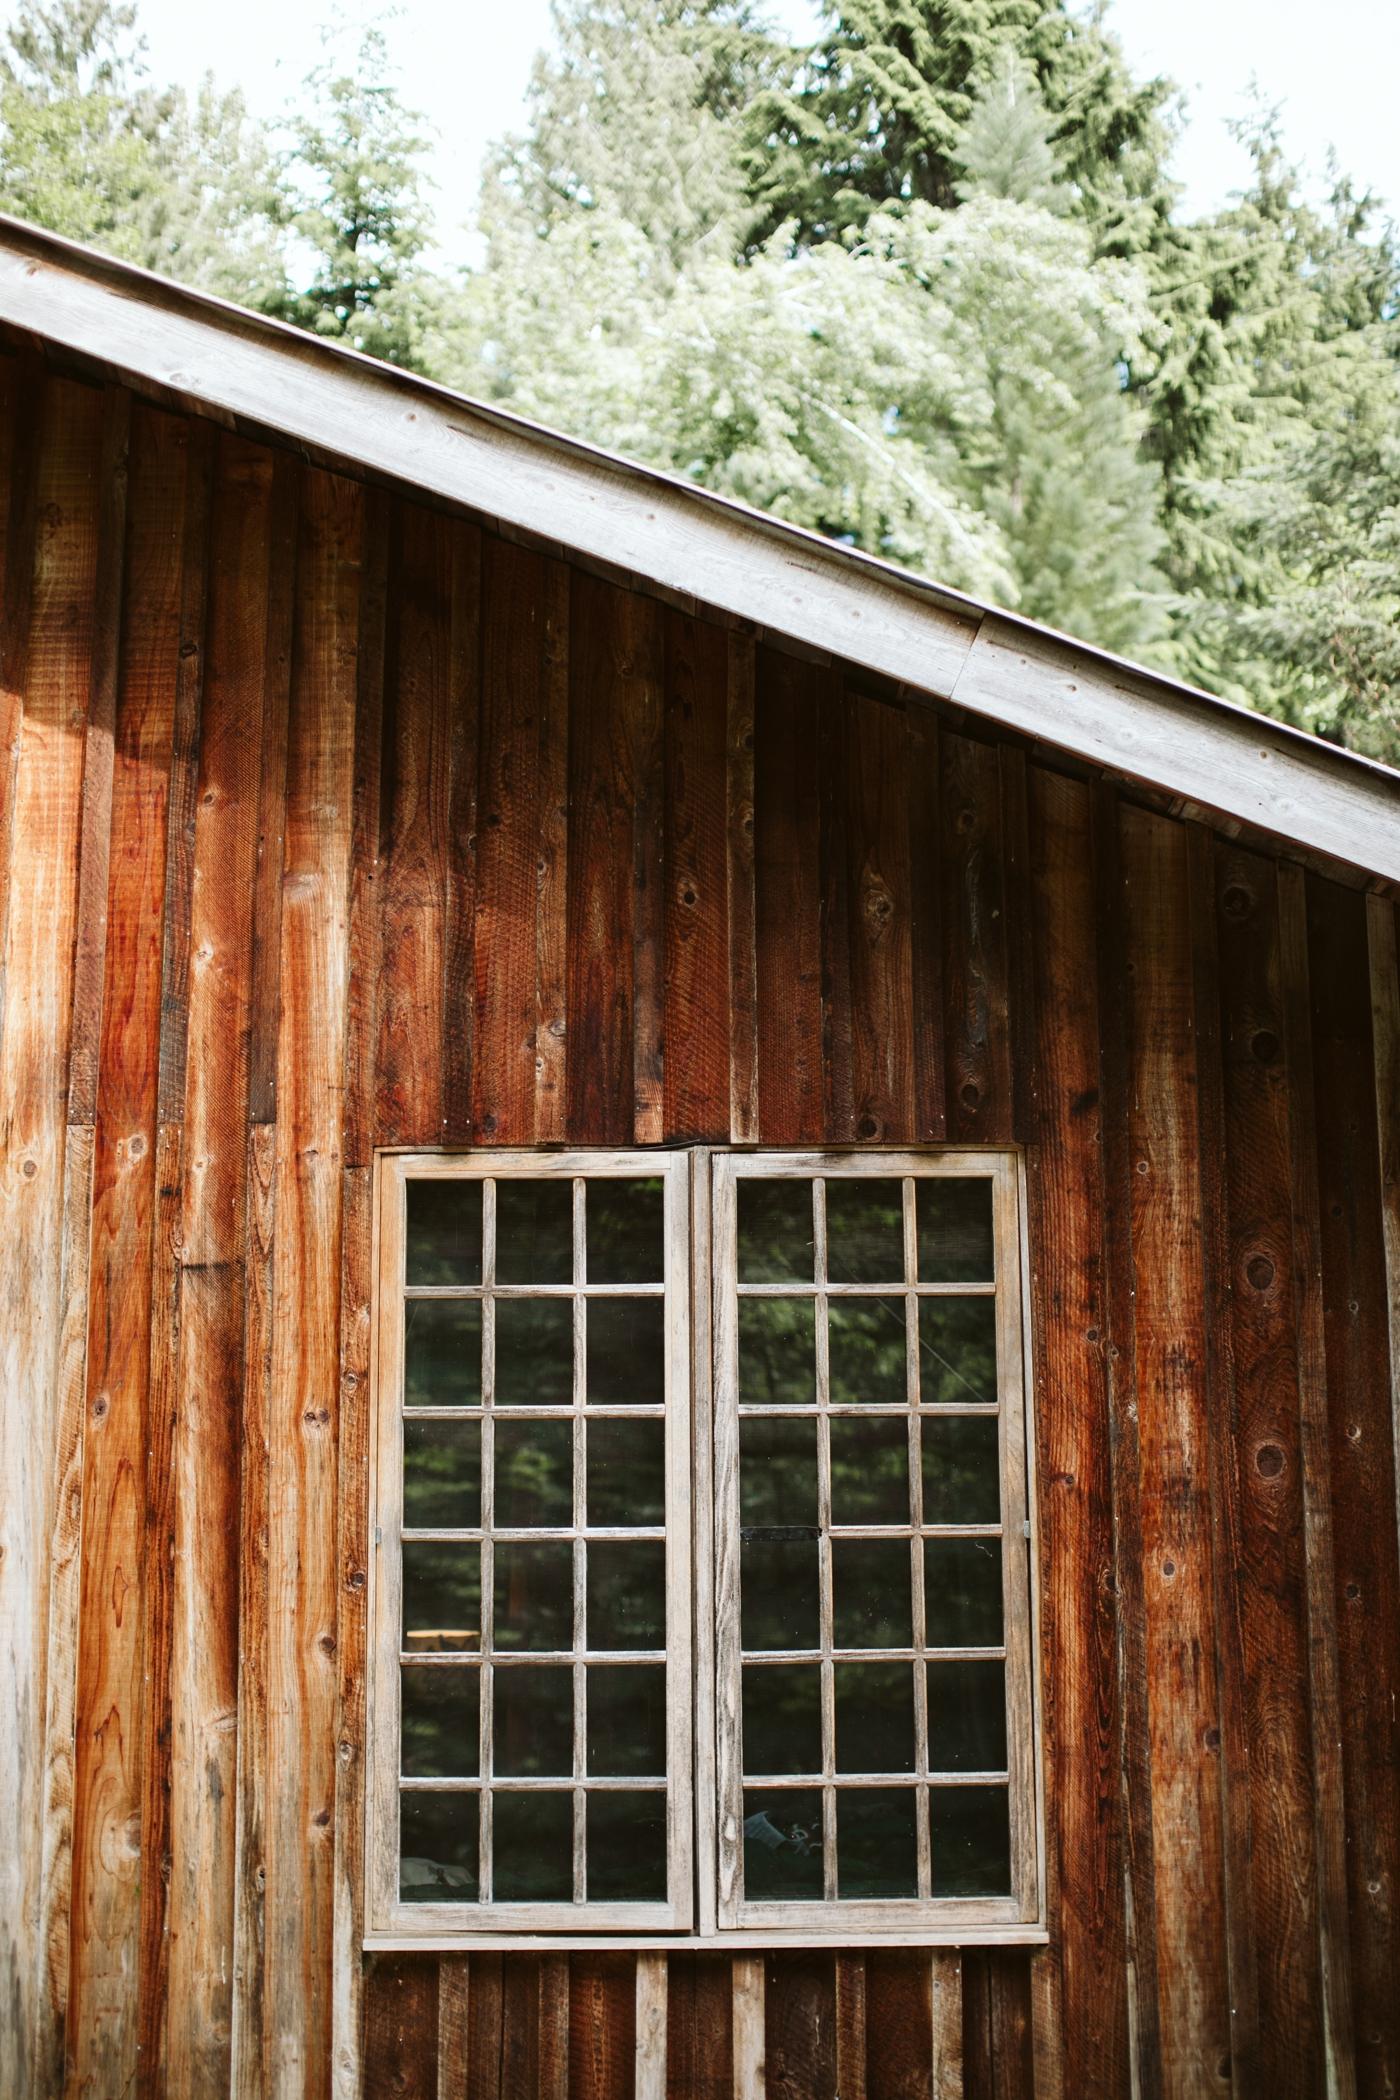 forest-adventure-mountain-top-elopement-photographer-pnw-seattle-washington-wedding-engagement-hike-photography-alaska-anchorage-dutch-harbor-northcascades-mtrainier-pnw-catie-bergman-pacific-northwest-_0115.jpg